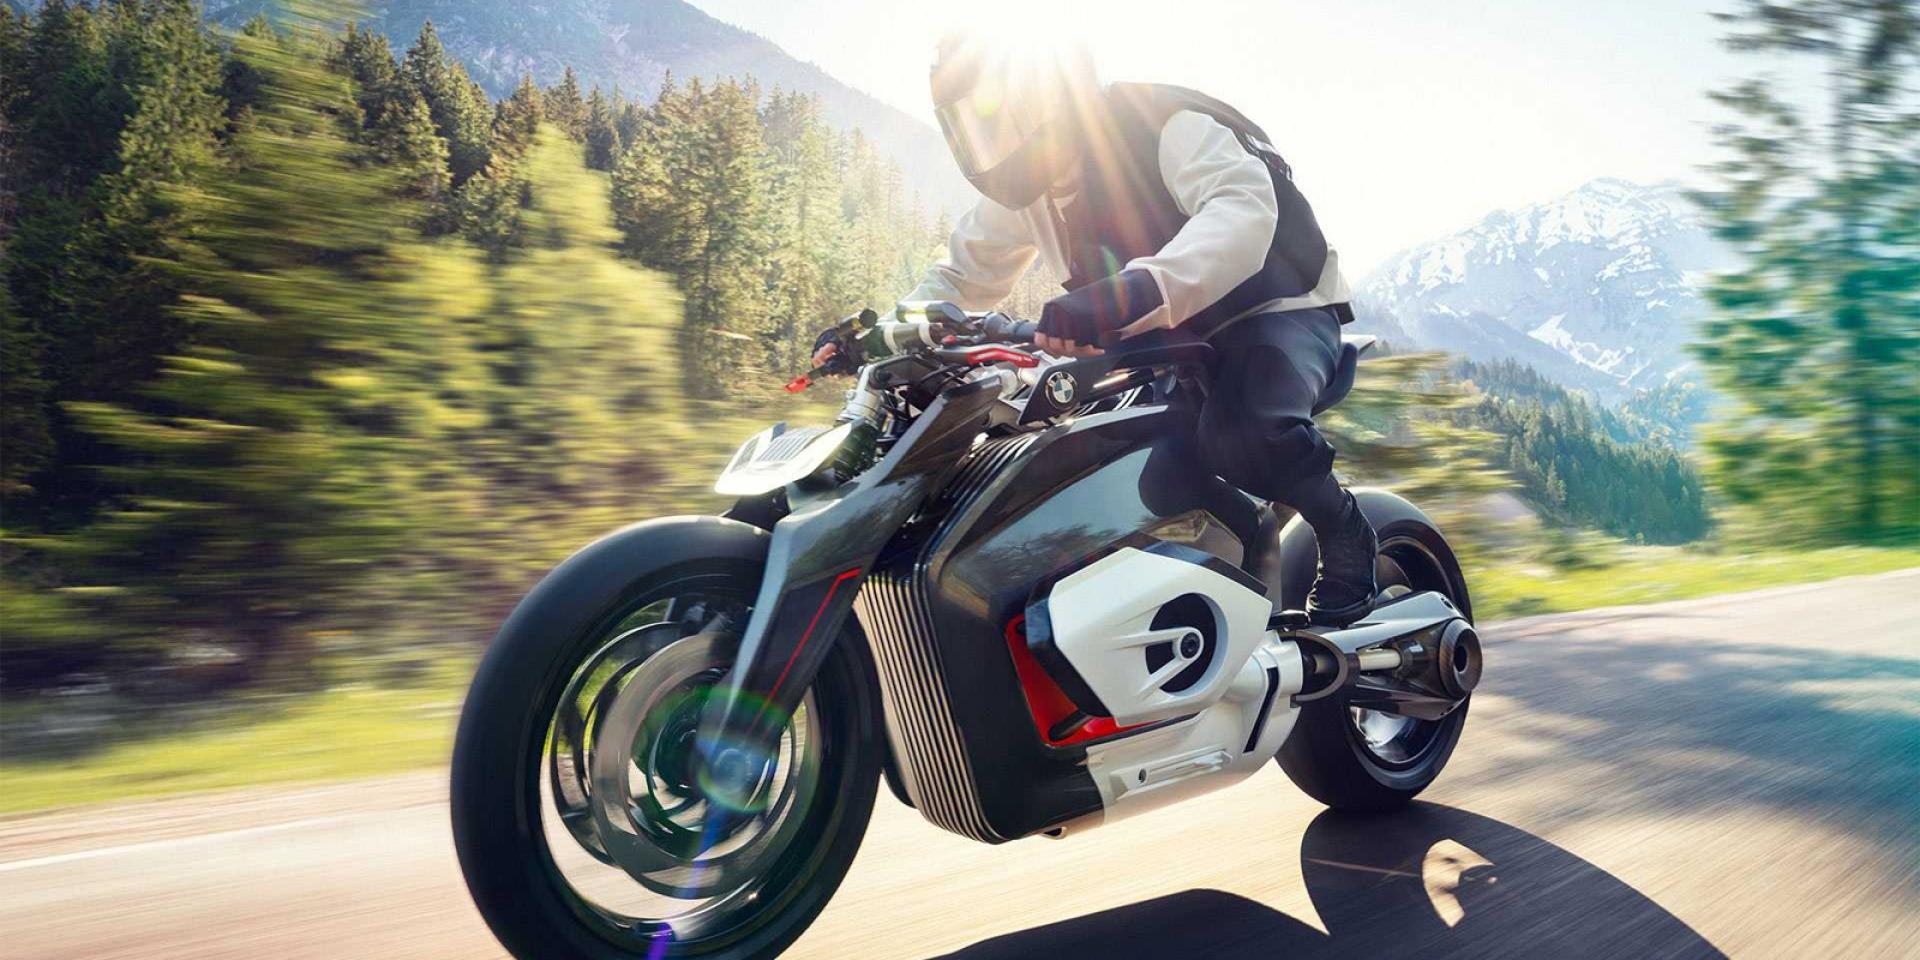 Vision DC Roadster準備上市?BMW註冊11項新商標,積極佈局電動車市場!